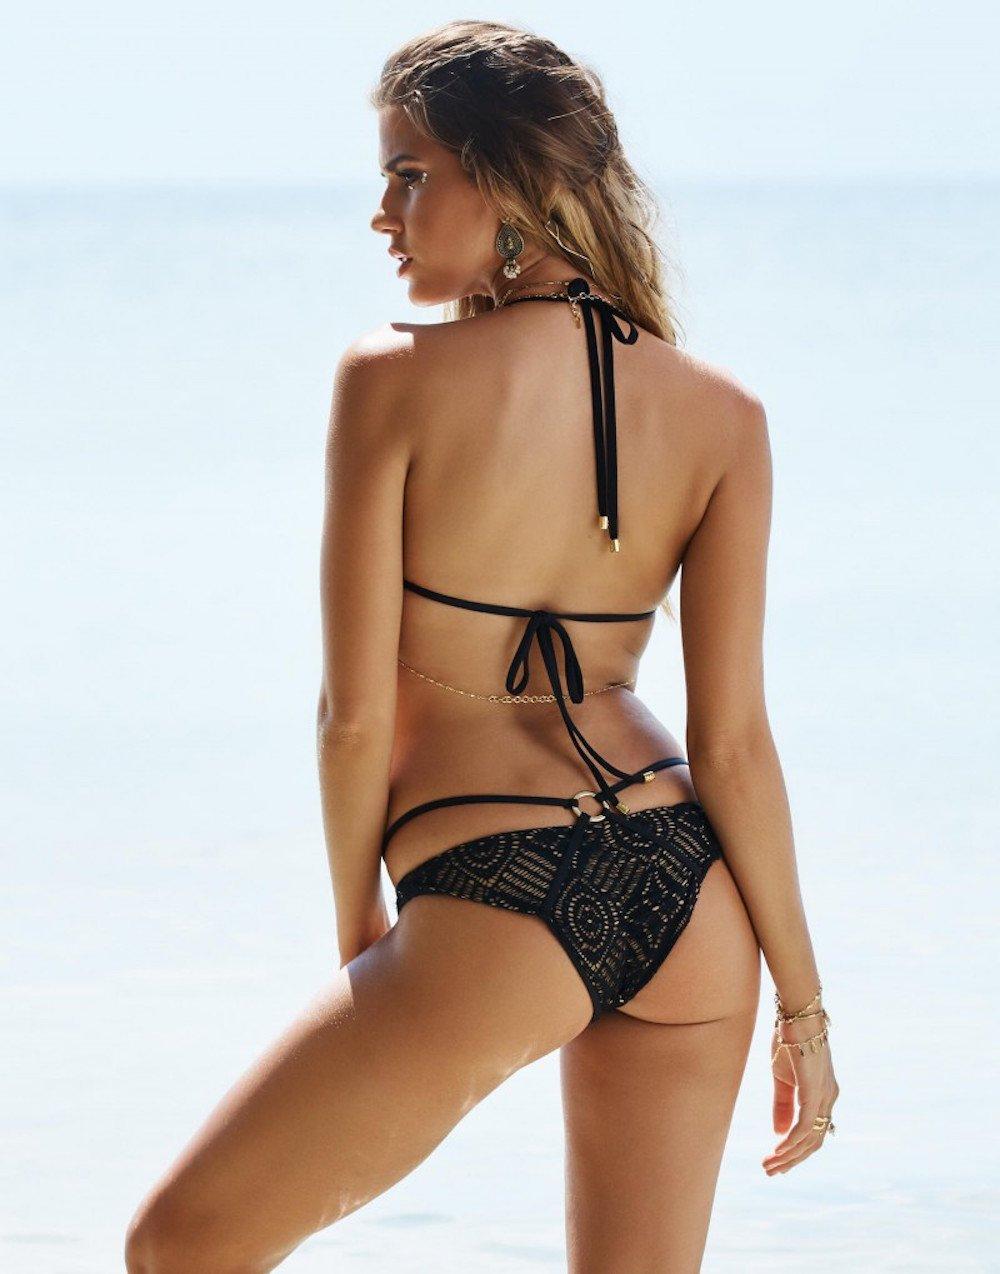 Beach Bunny Women's Love Me Like You Do Skimpy Bikini Bottom, Black, S by Beach Bunny (Image #3)